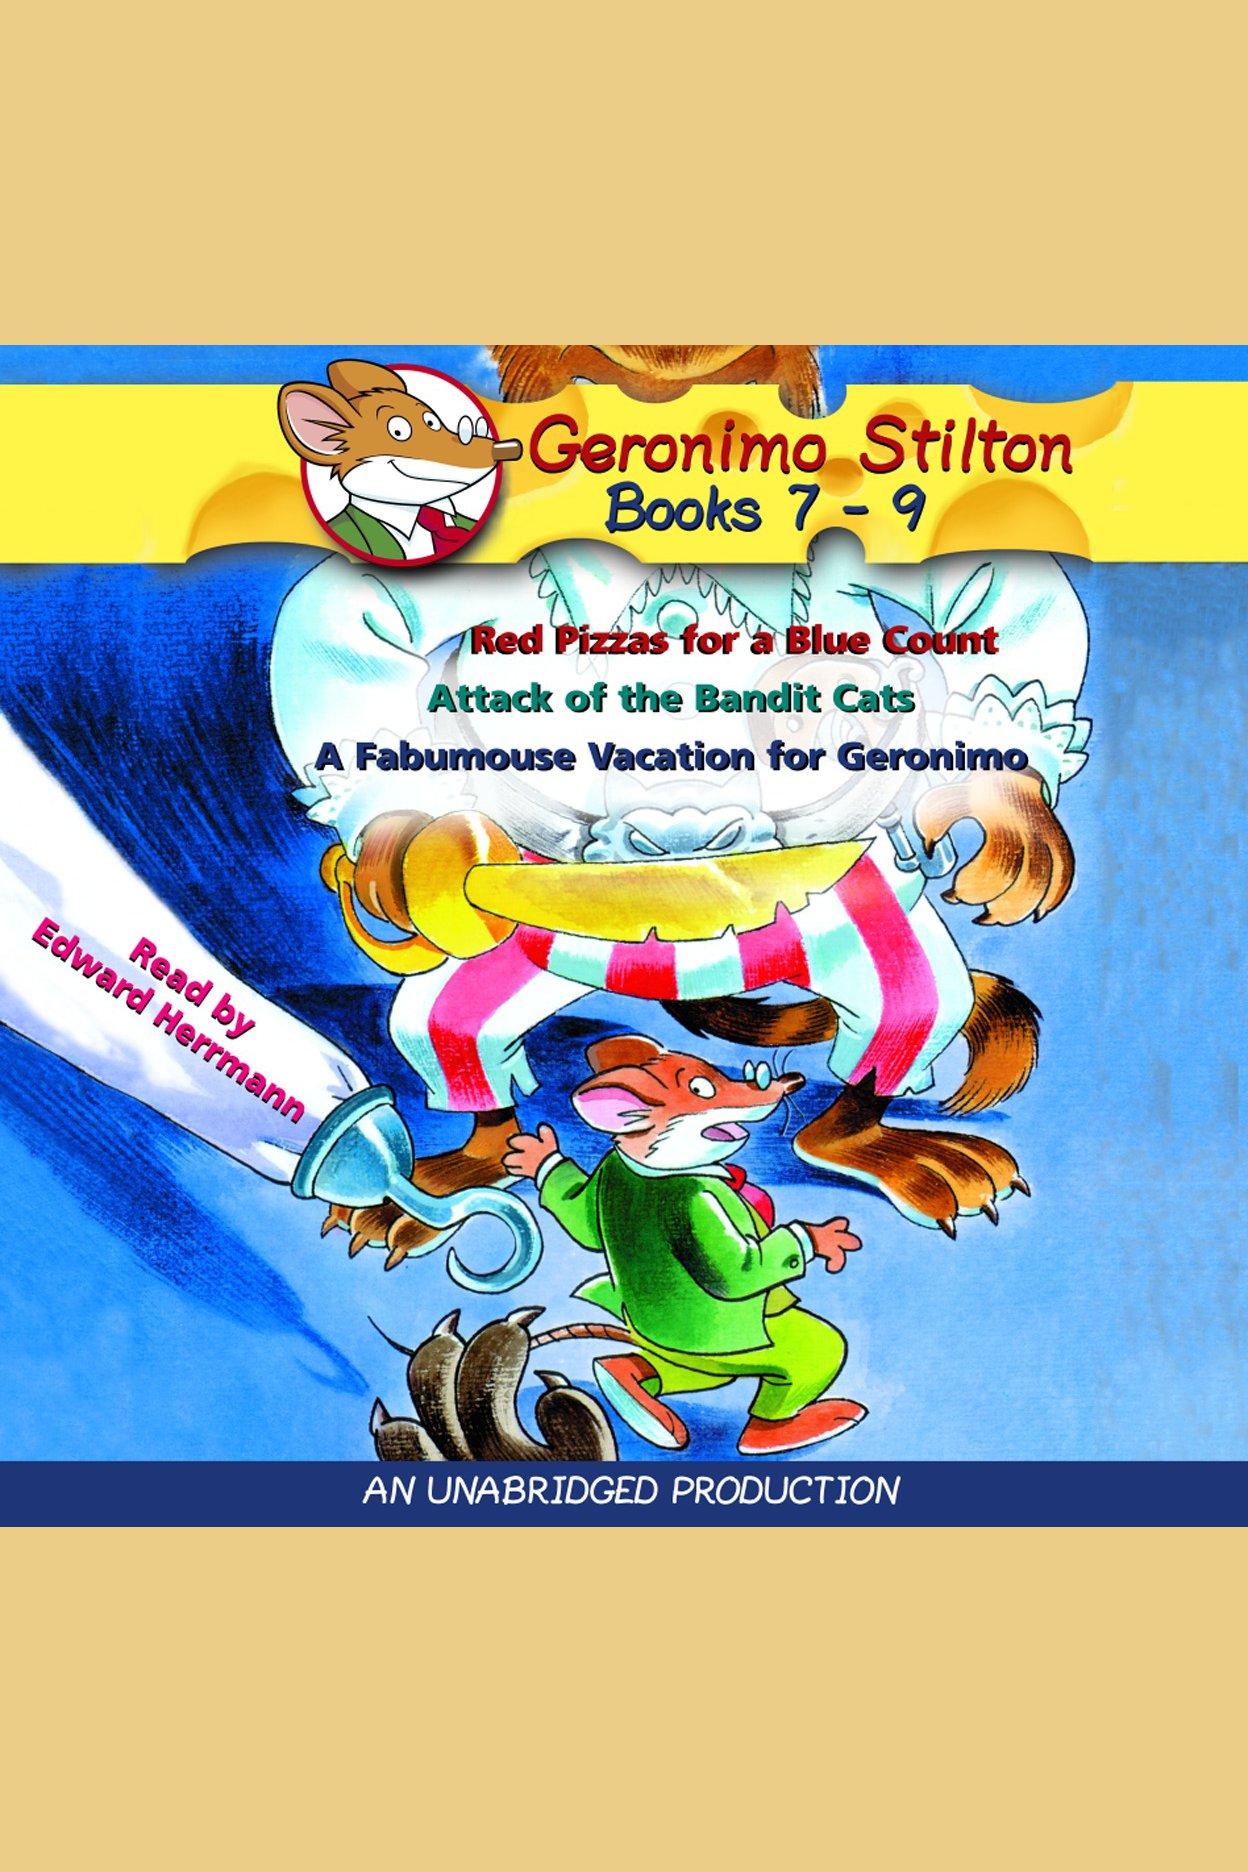 Geronimo Stilton: Books 7-9 cover image